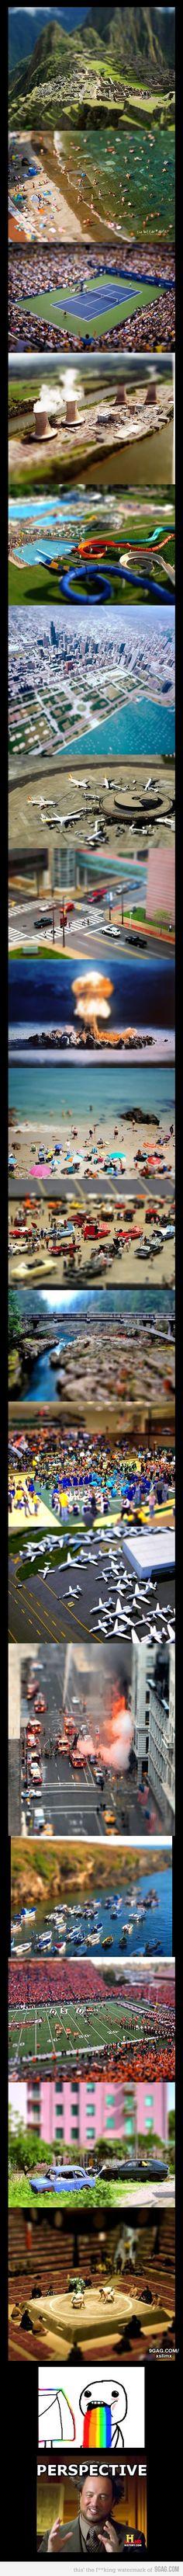 tilt shift photography -- makes everything look like miniatures. mindfuckkkk